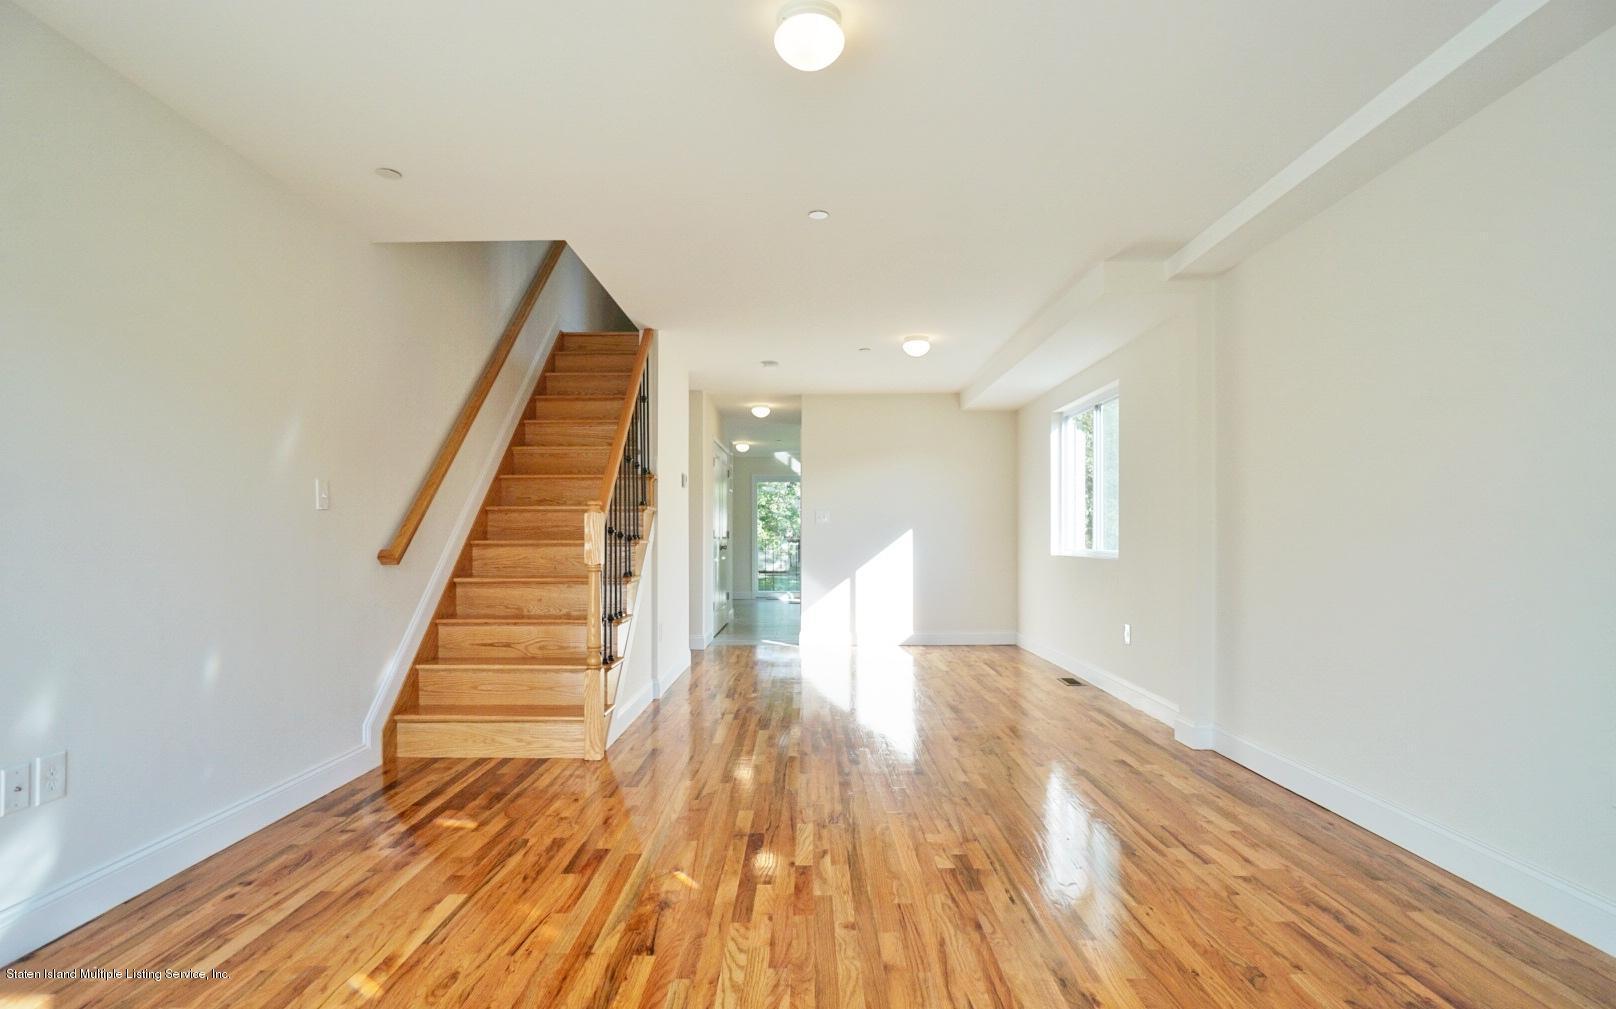 347 Van Pelt Avenue,Staten Island,New York,10303,United States,3 Bedrooms Bedrooms,6 Rooms Rooms,3 BathroomsBathrooms,Residential,Van Pelt,1132927